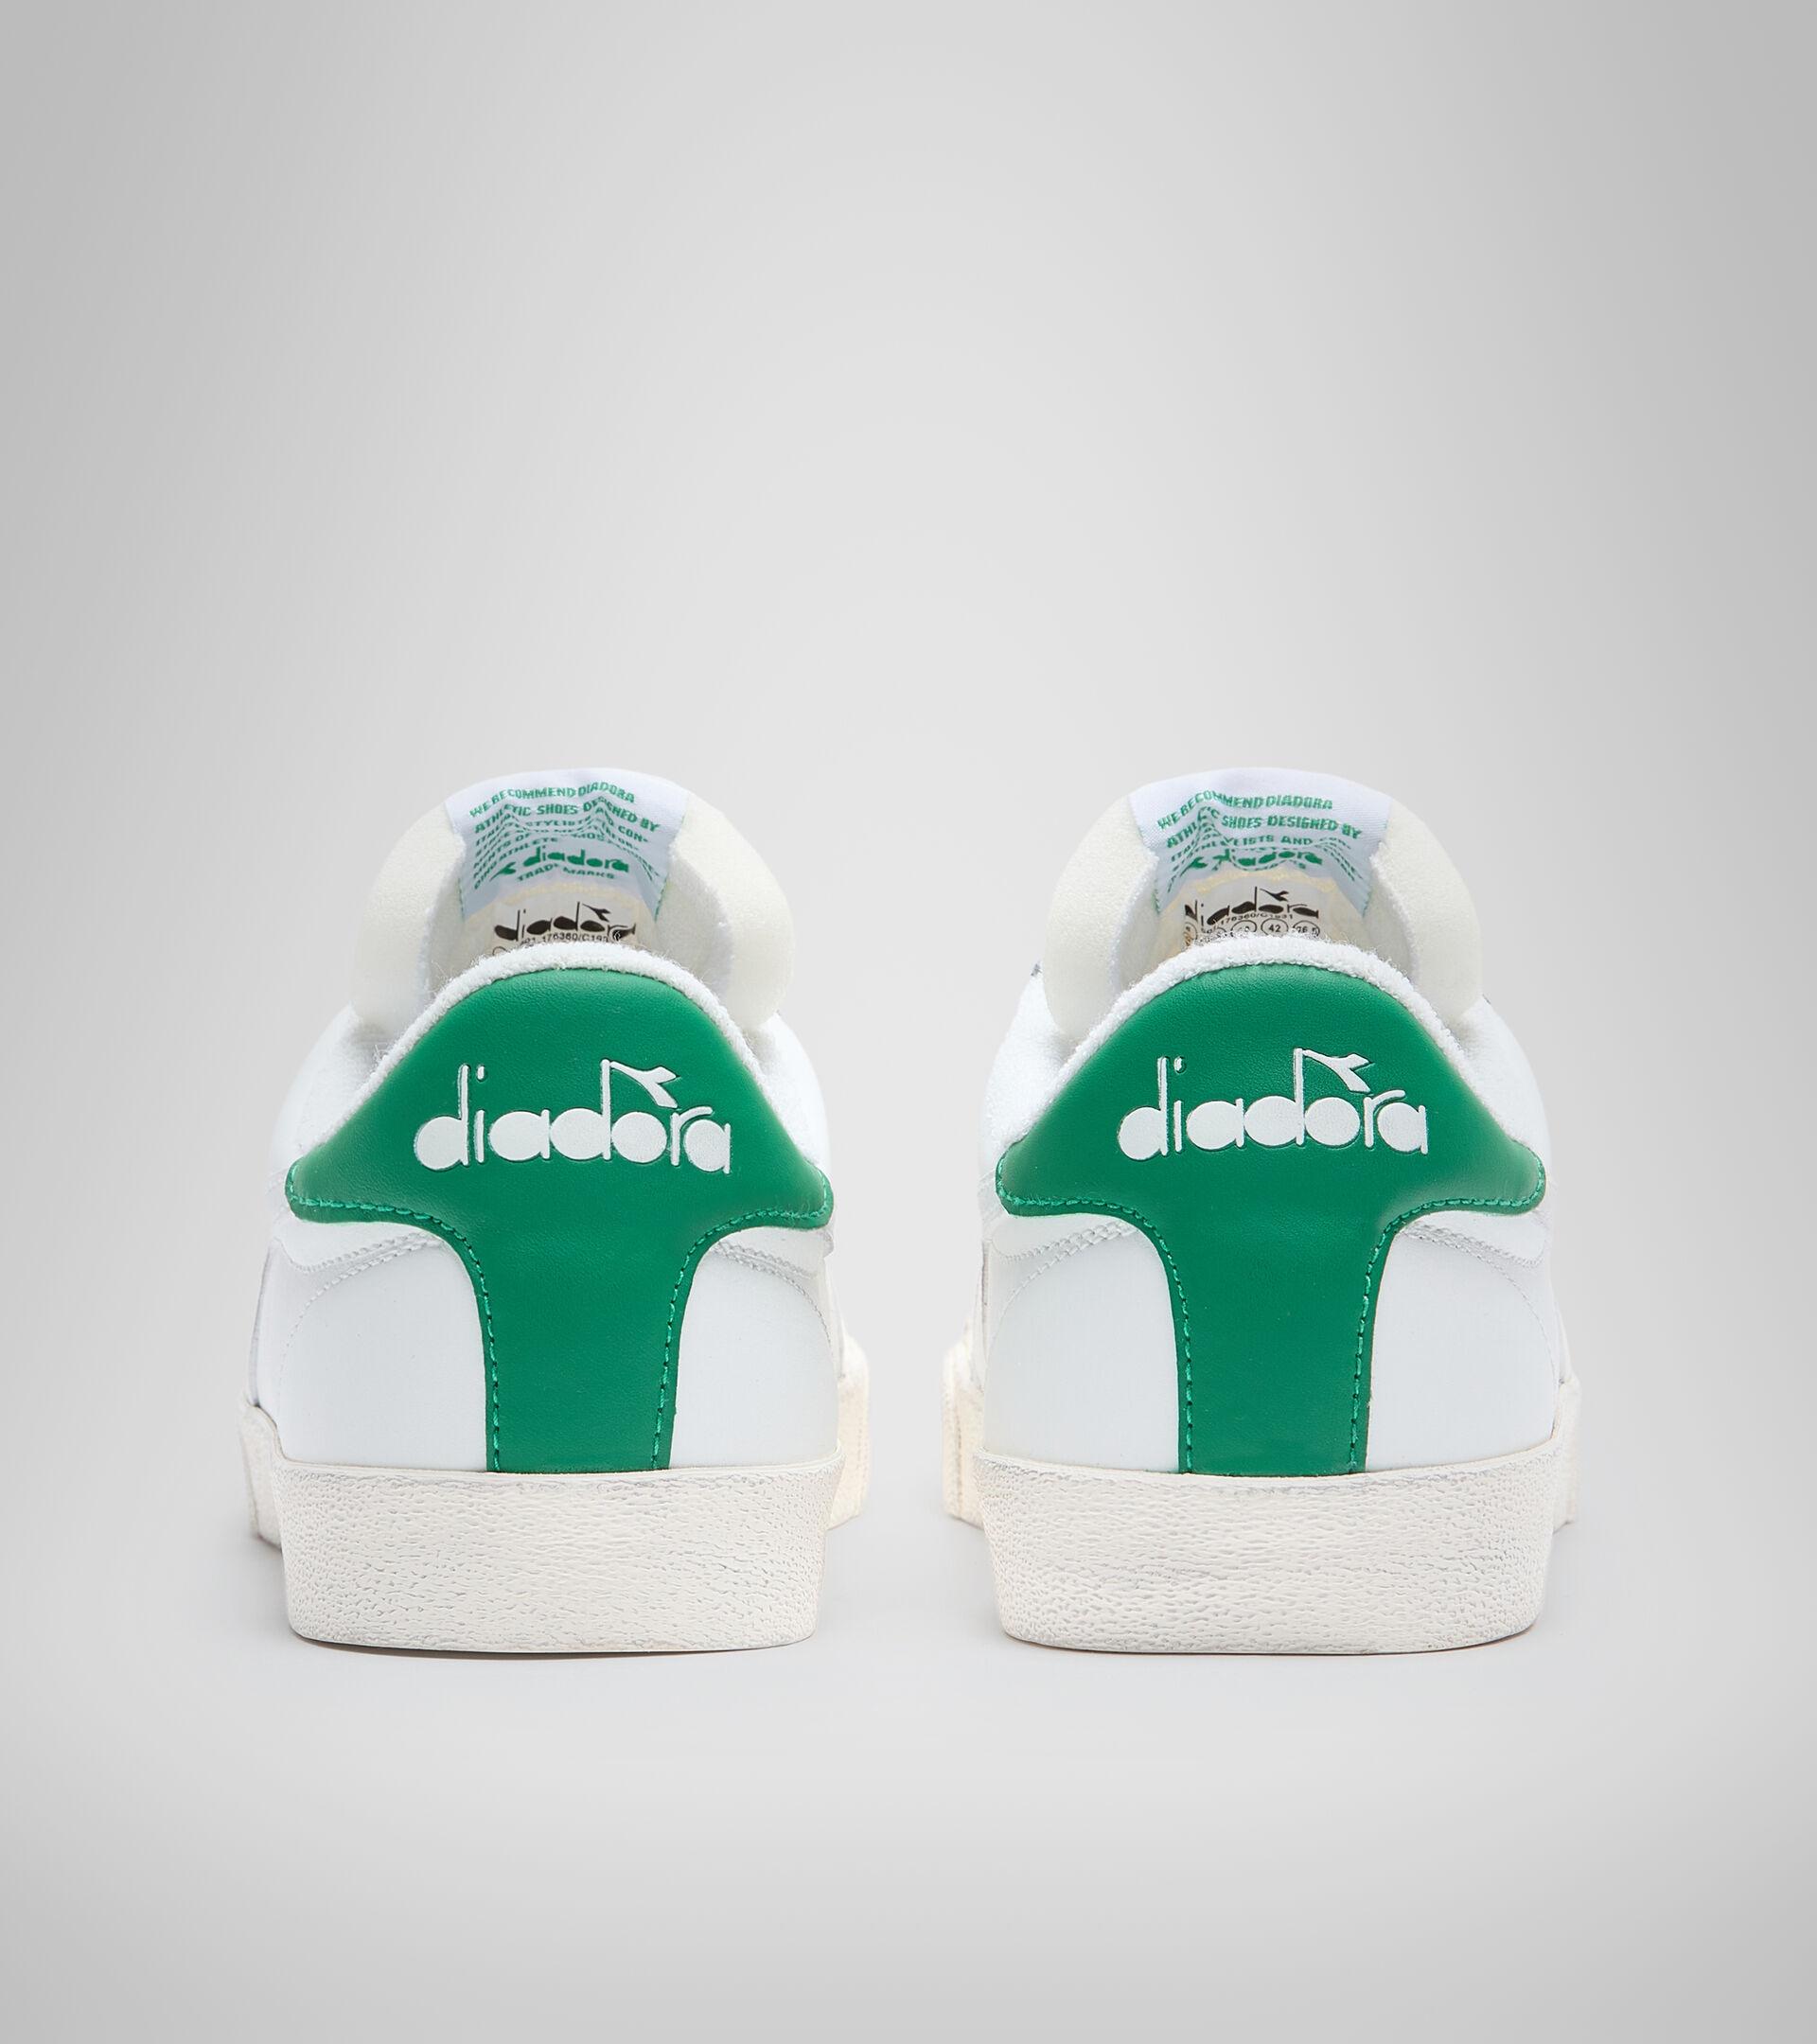 Zapatilla deportiva - Unisex MELODY LEATHER DIRTY BLANCO/VERDE GOMINOLA - Diadora